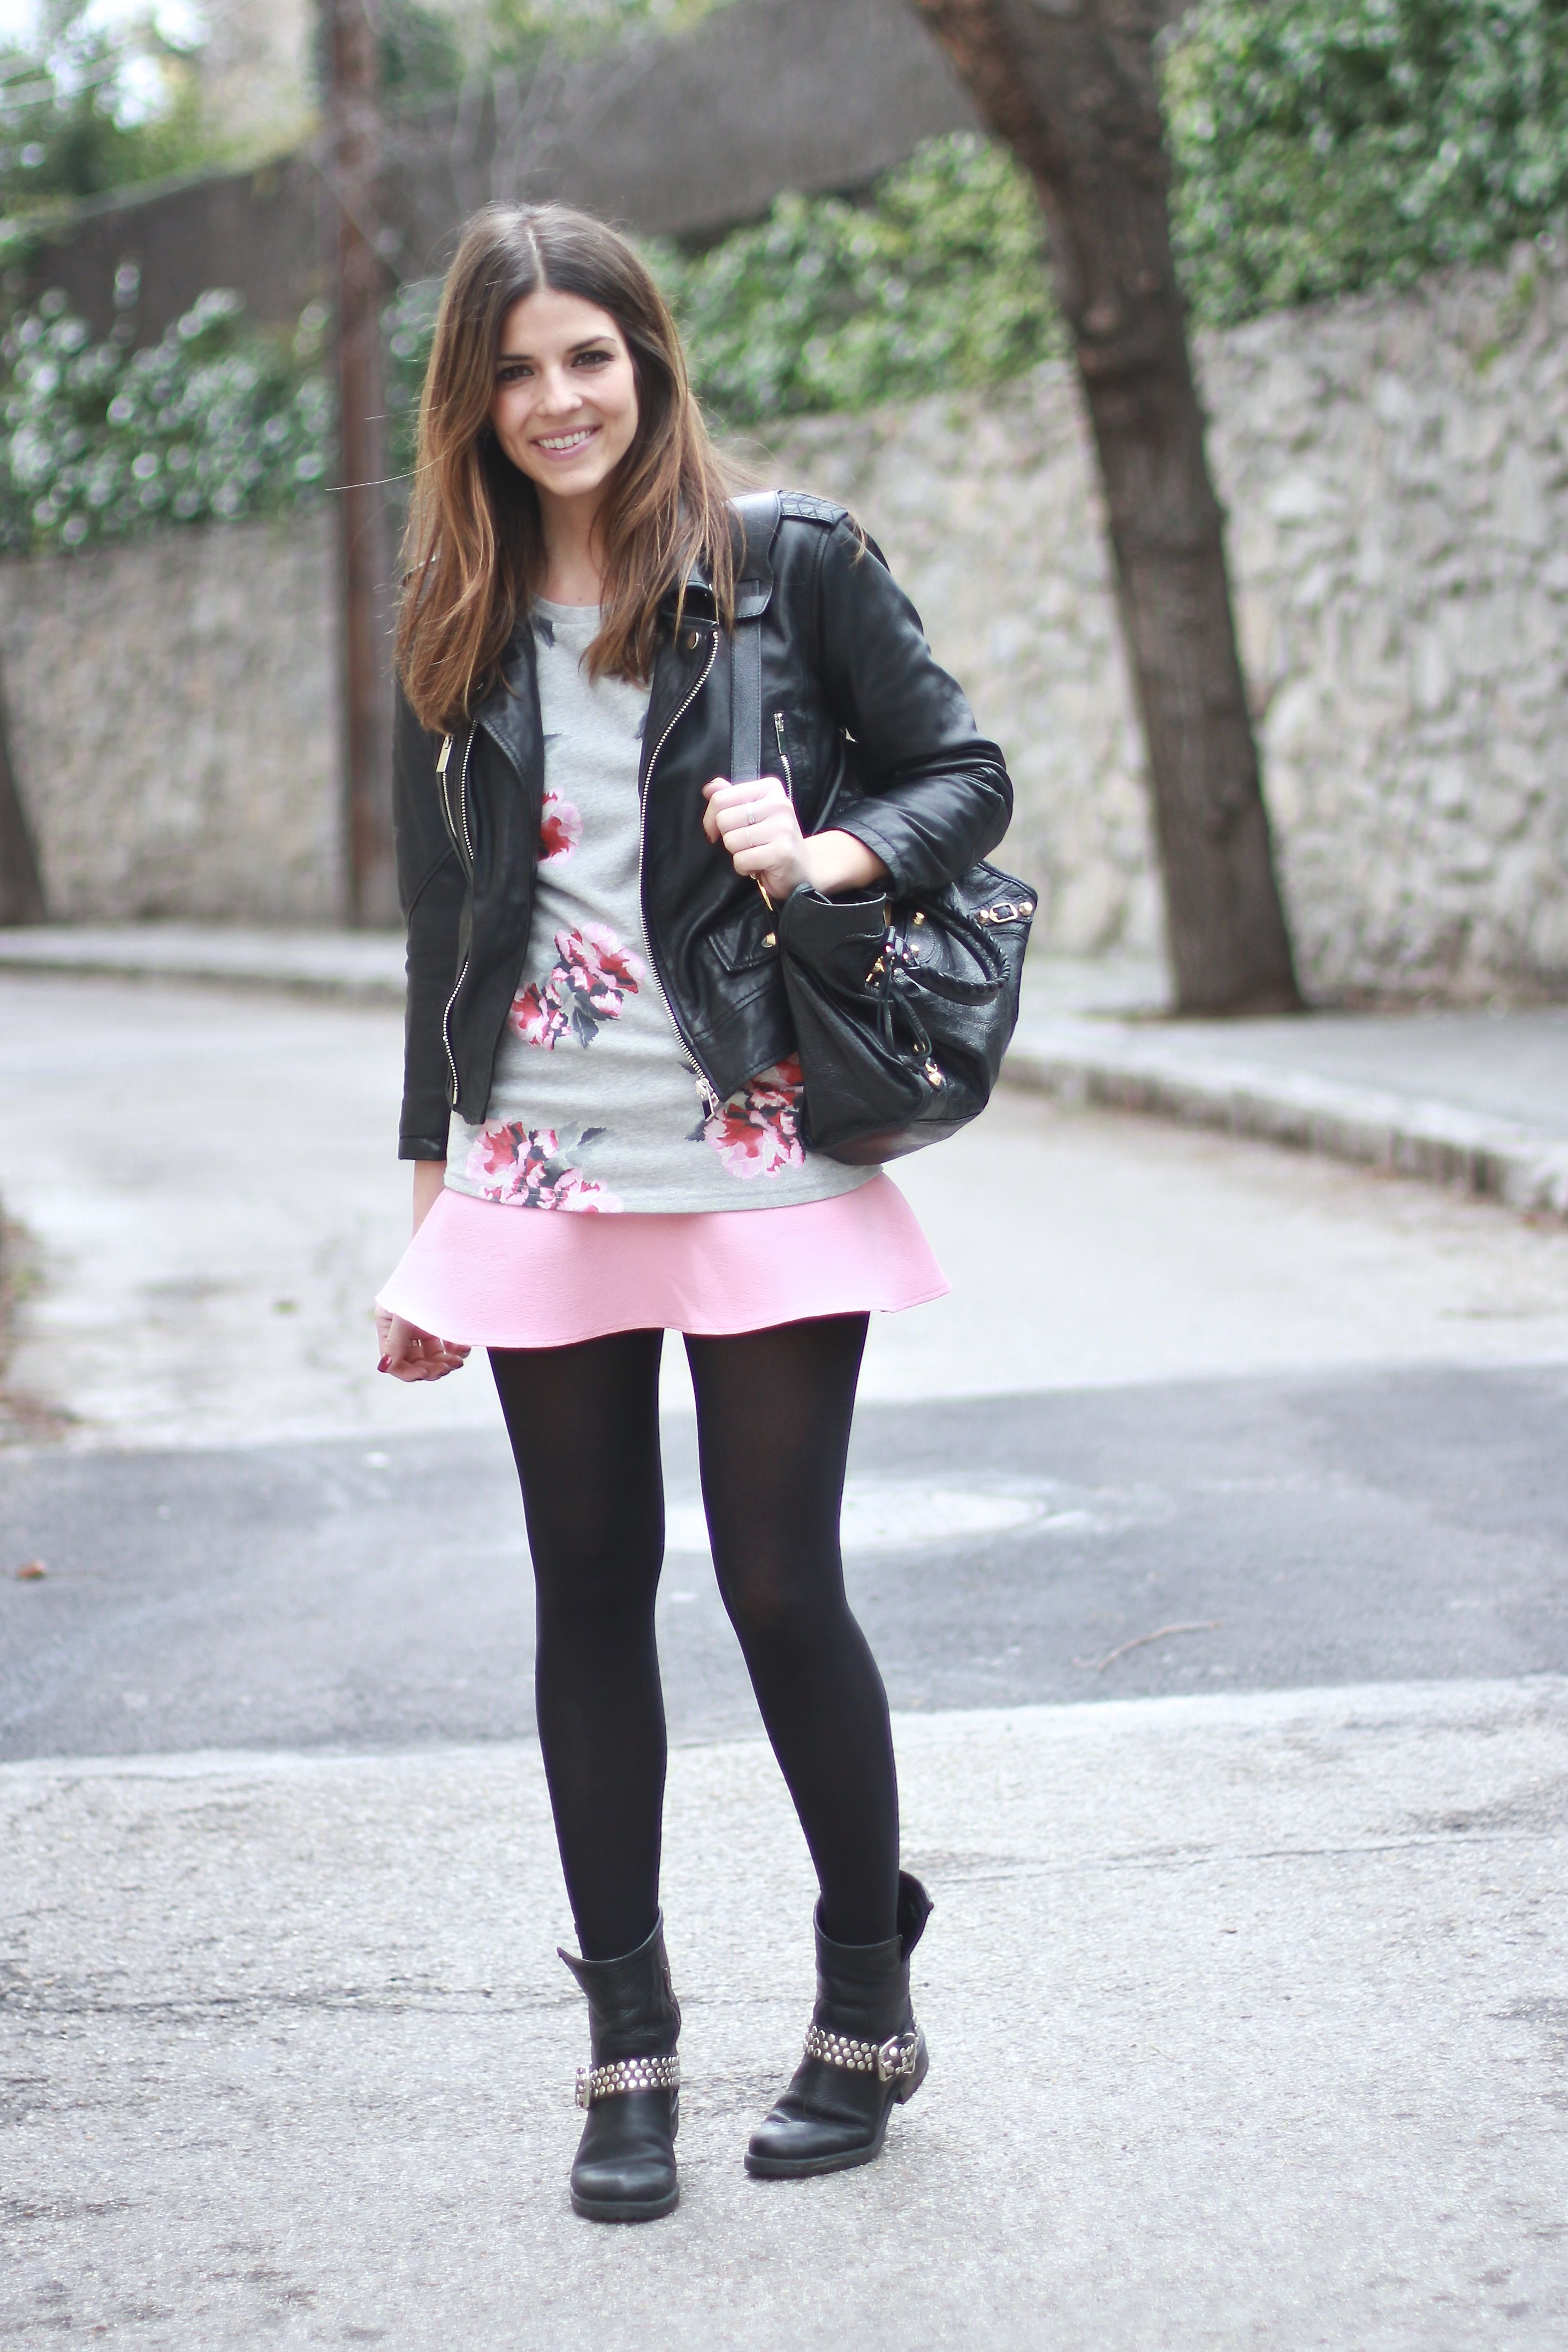 trendy_taste-look-outfit-street_style-ootd-fashion_spain-moda_españa-blogger-flower_print-estampado-sudadera_slores-sweatshirt-pink_skirt-falda_rosa-steve_madden-botines_tachuelas-studed_booties-balenciaga_city_bag-look_rockero-polaroid-11